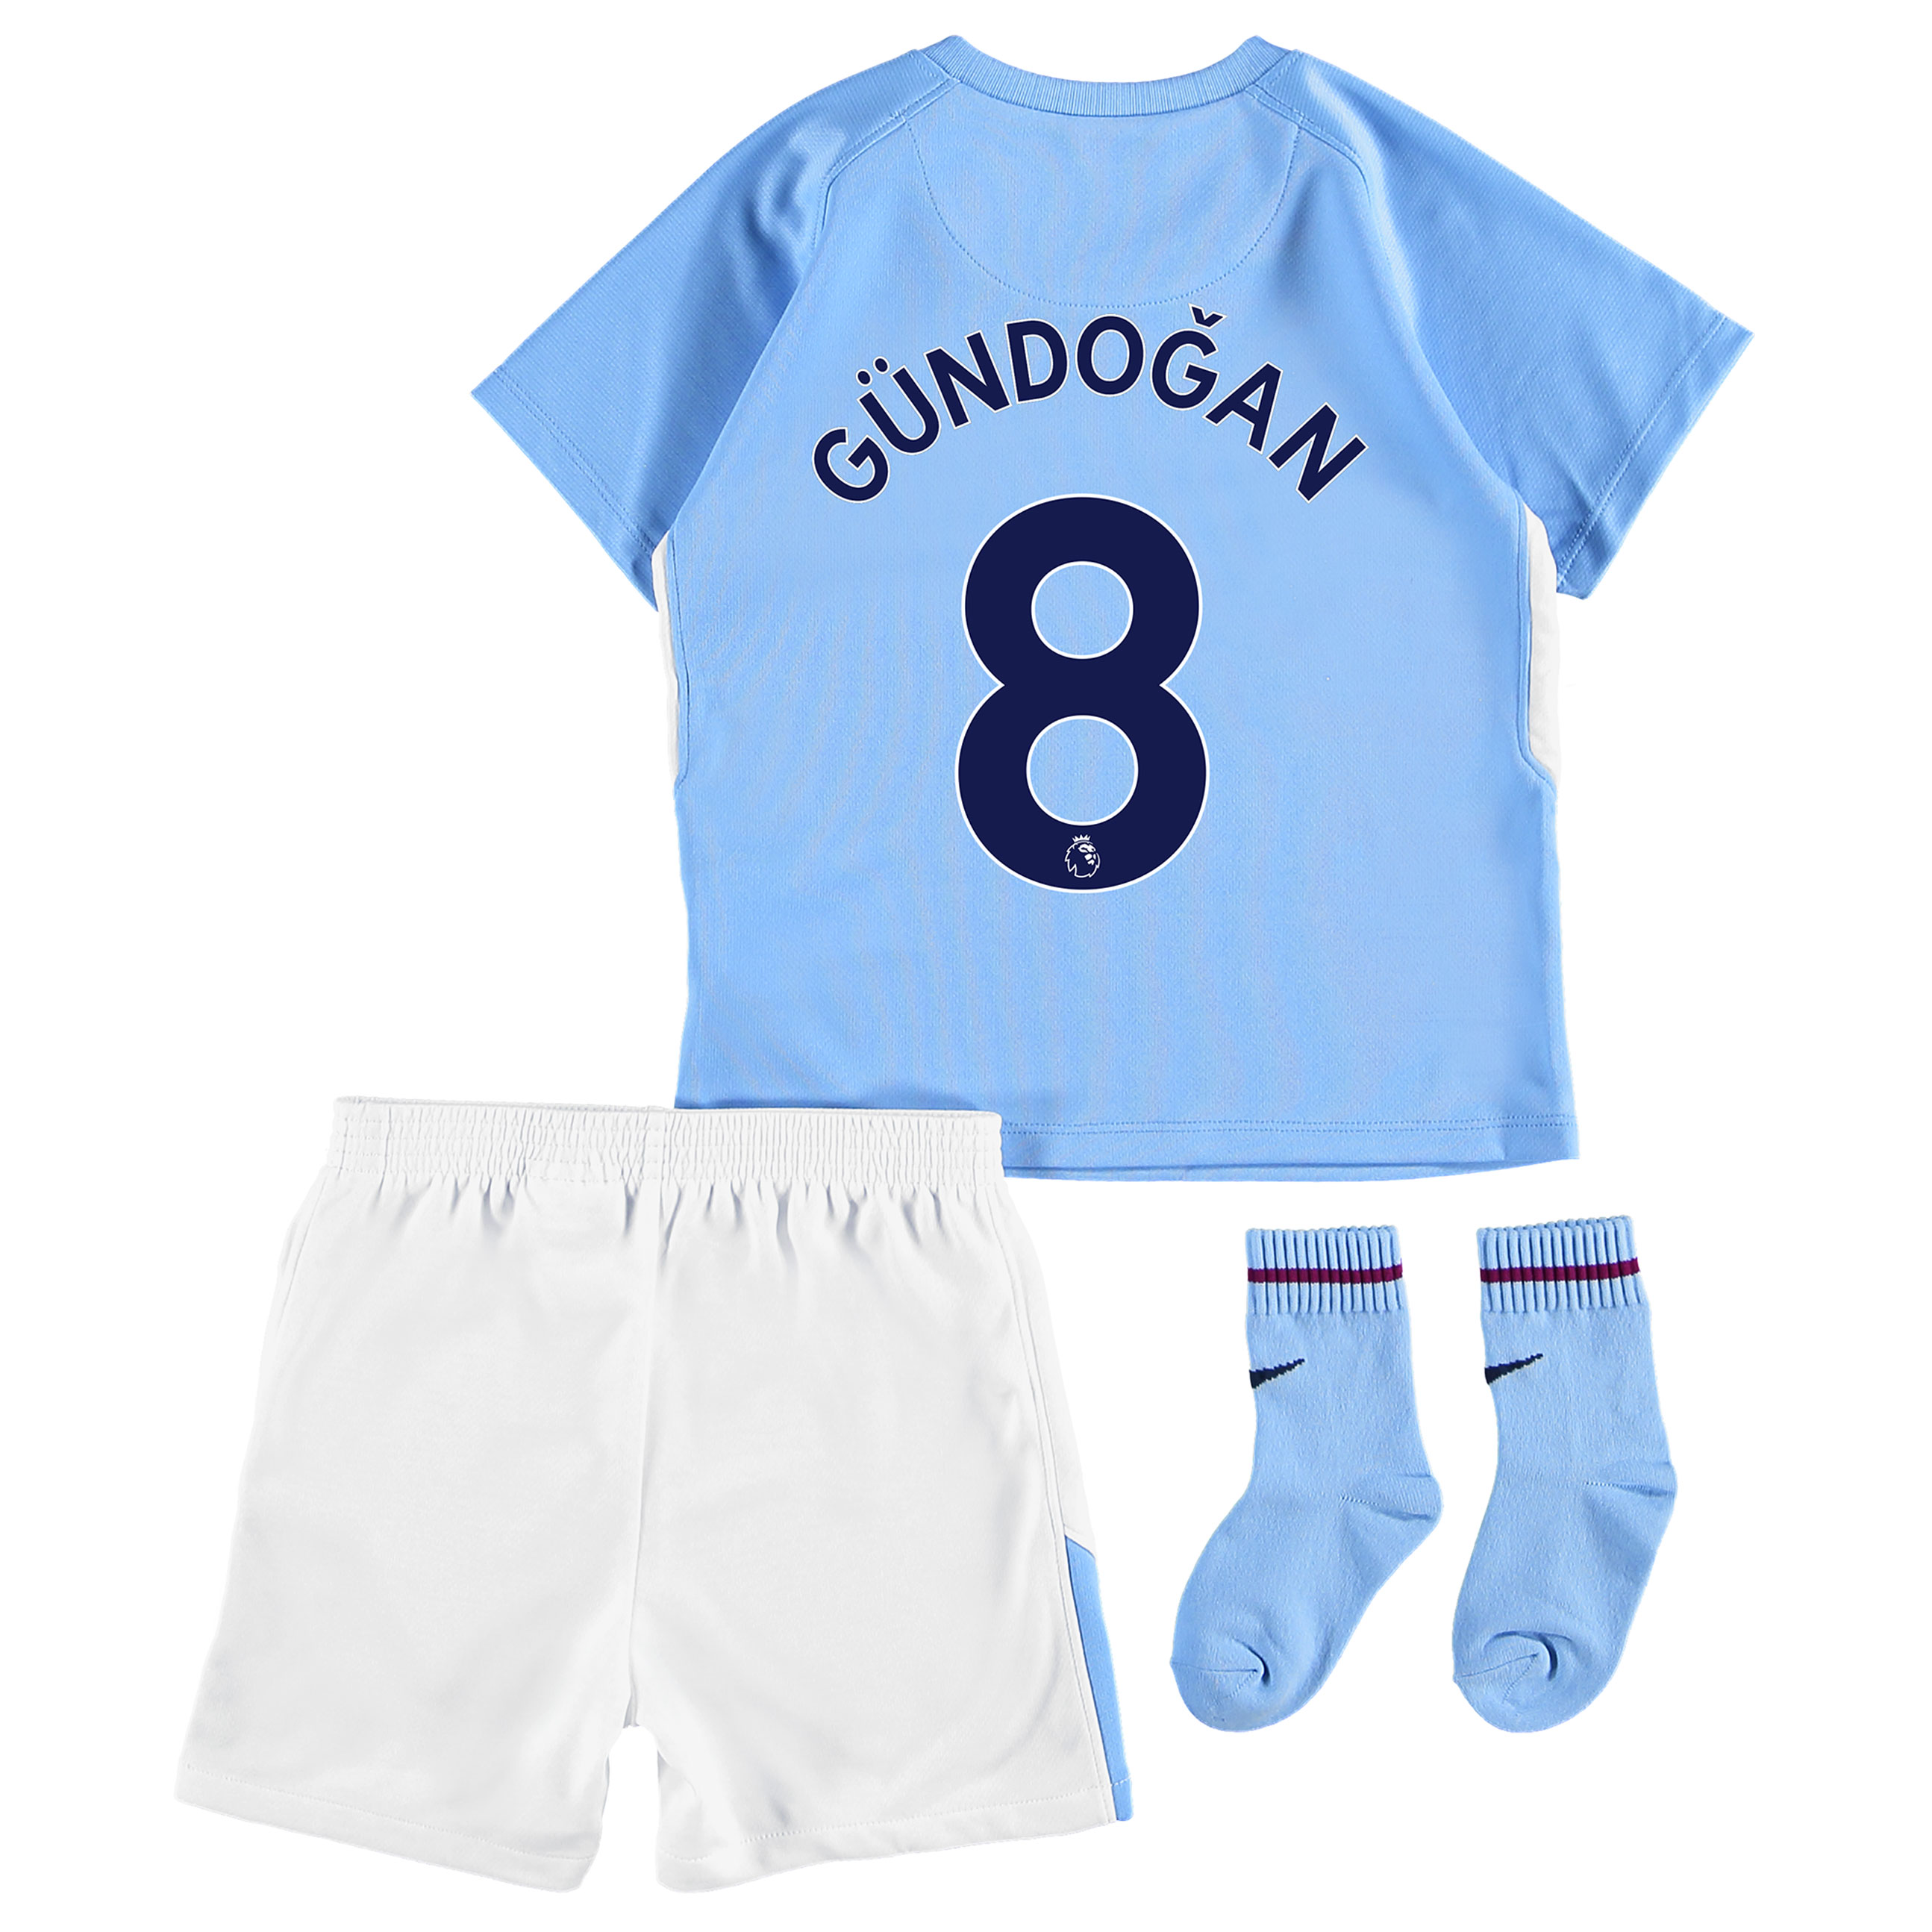 Manchester City Home Stadium Kit 2017-18 - Infants with G??ndogan 8 pri